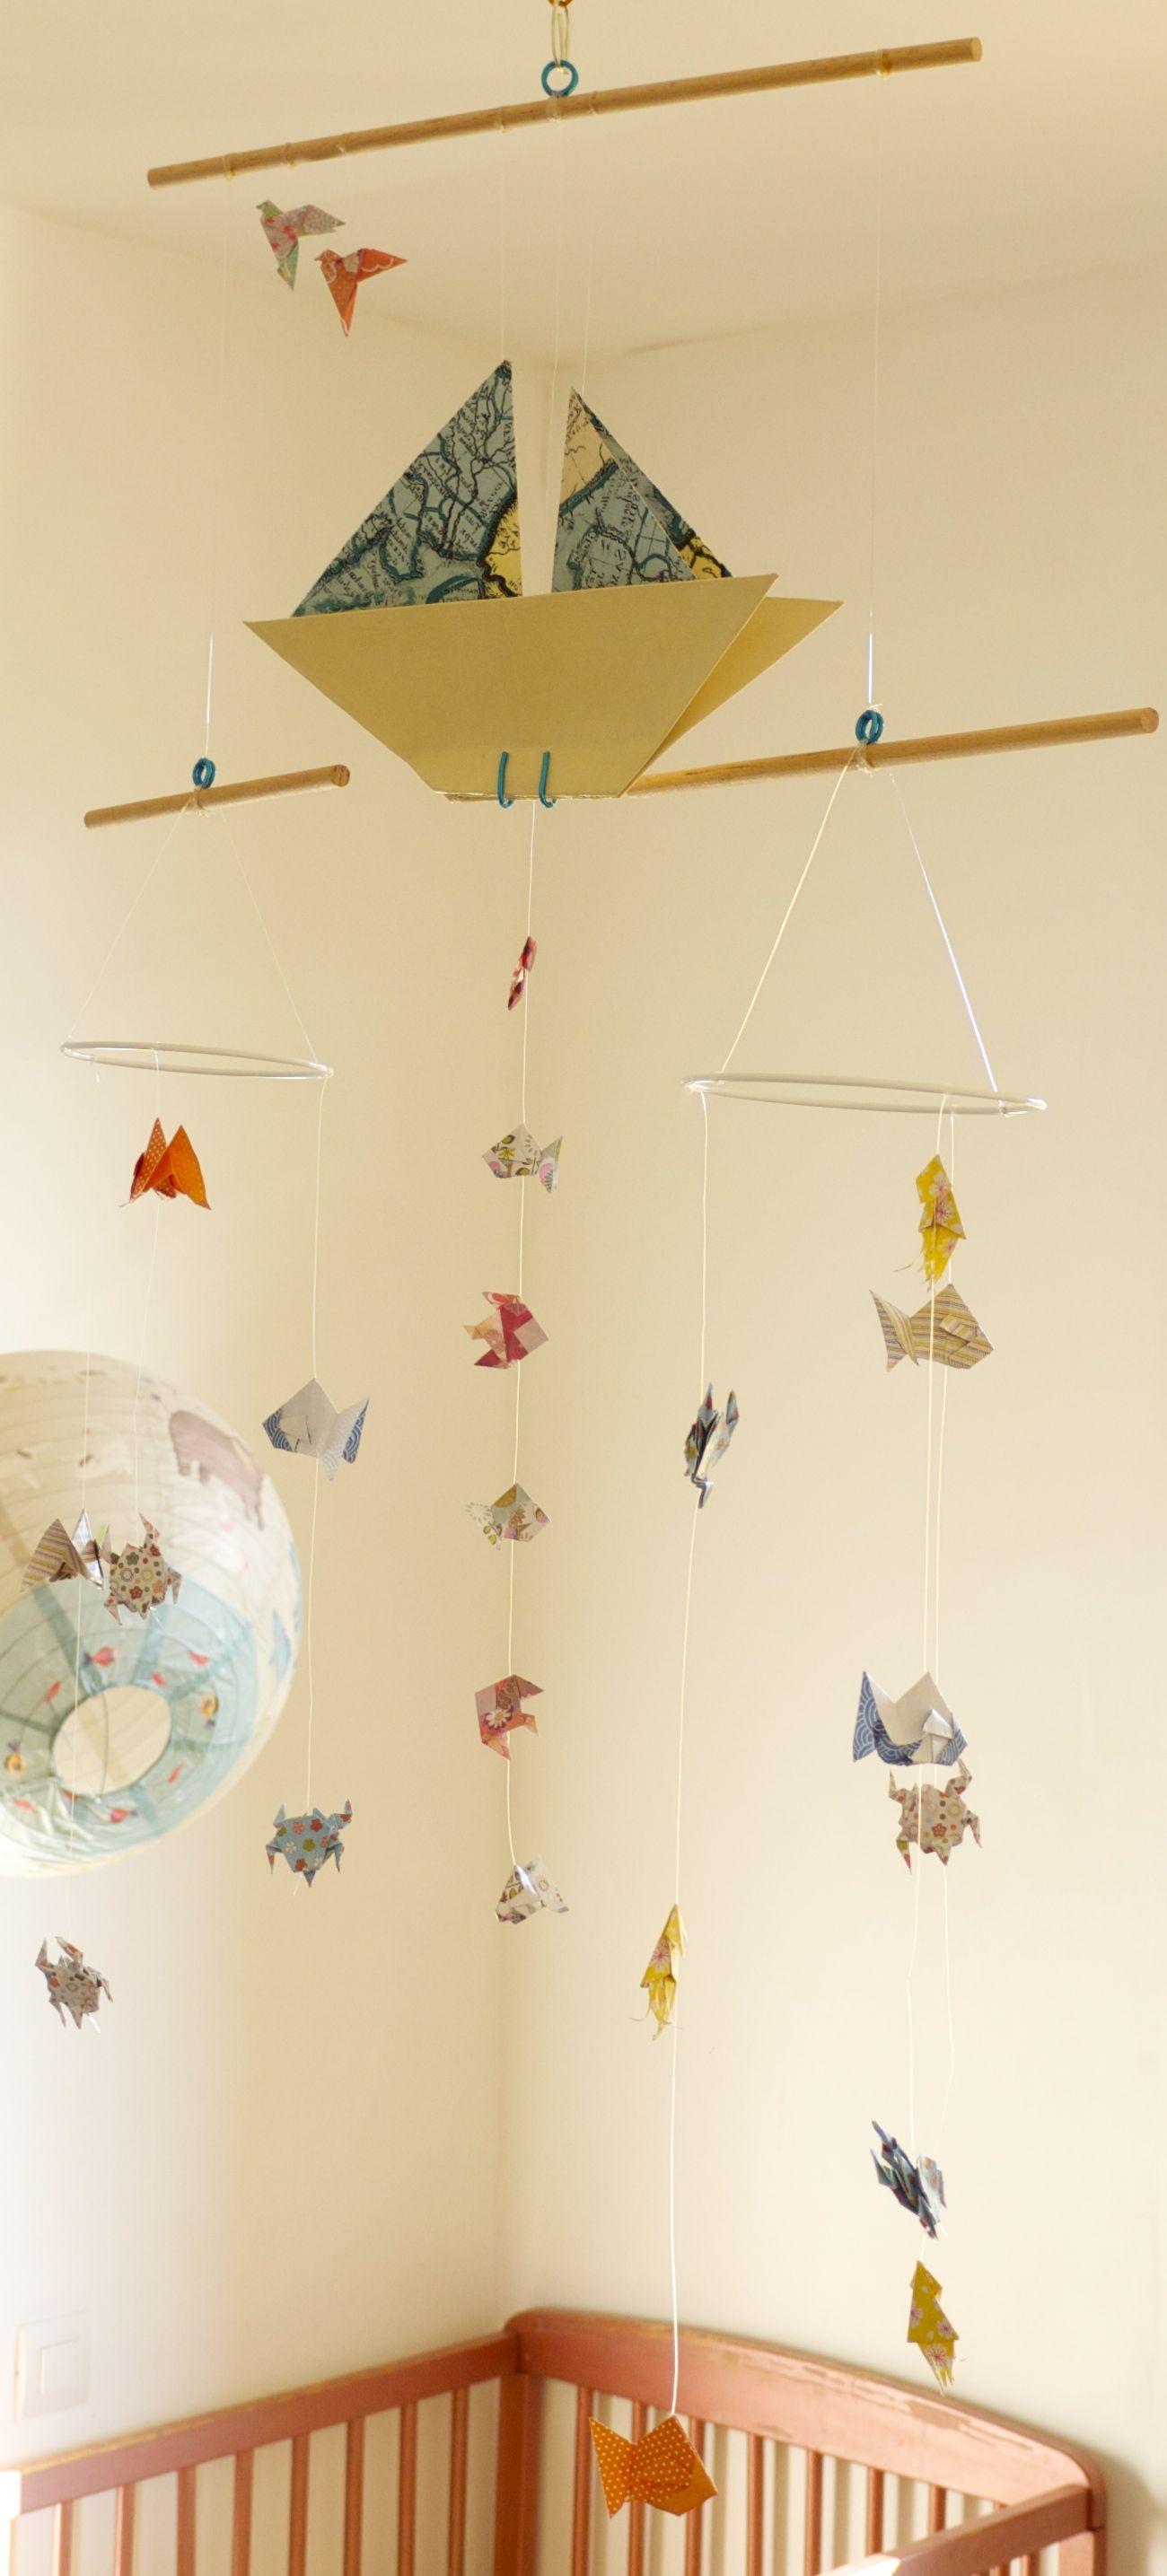 mobile b b origami suspension en bois chambre enfant bateau voilier poisson m duse babyshower. Black Bedroom Furniture Sets. Home Design Ideas